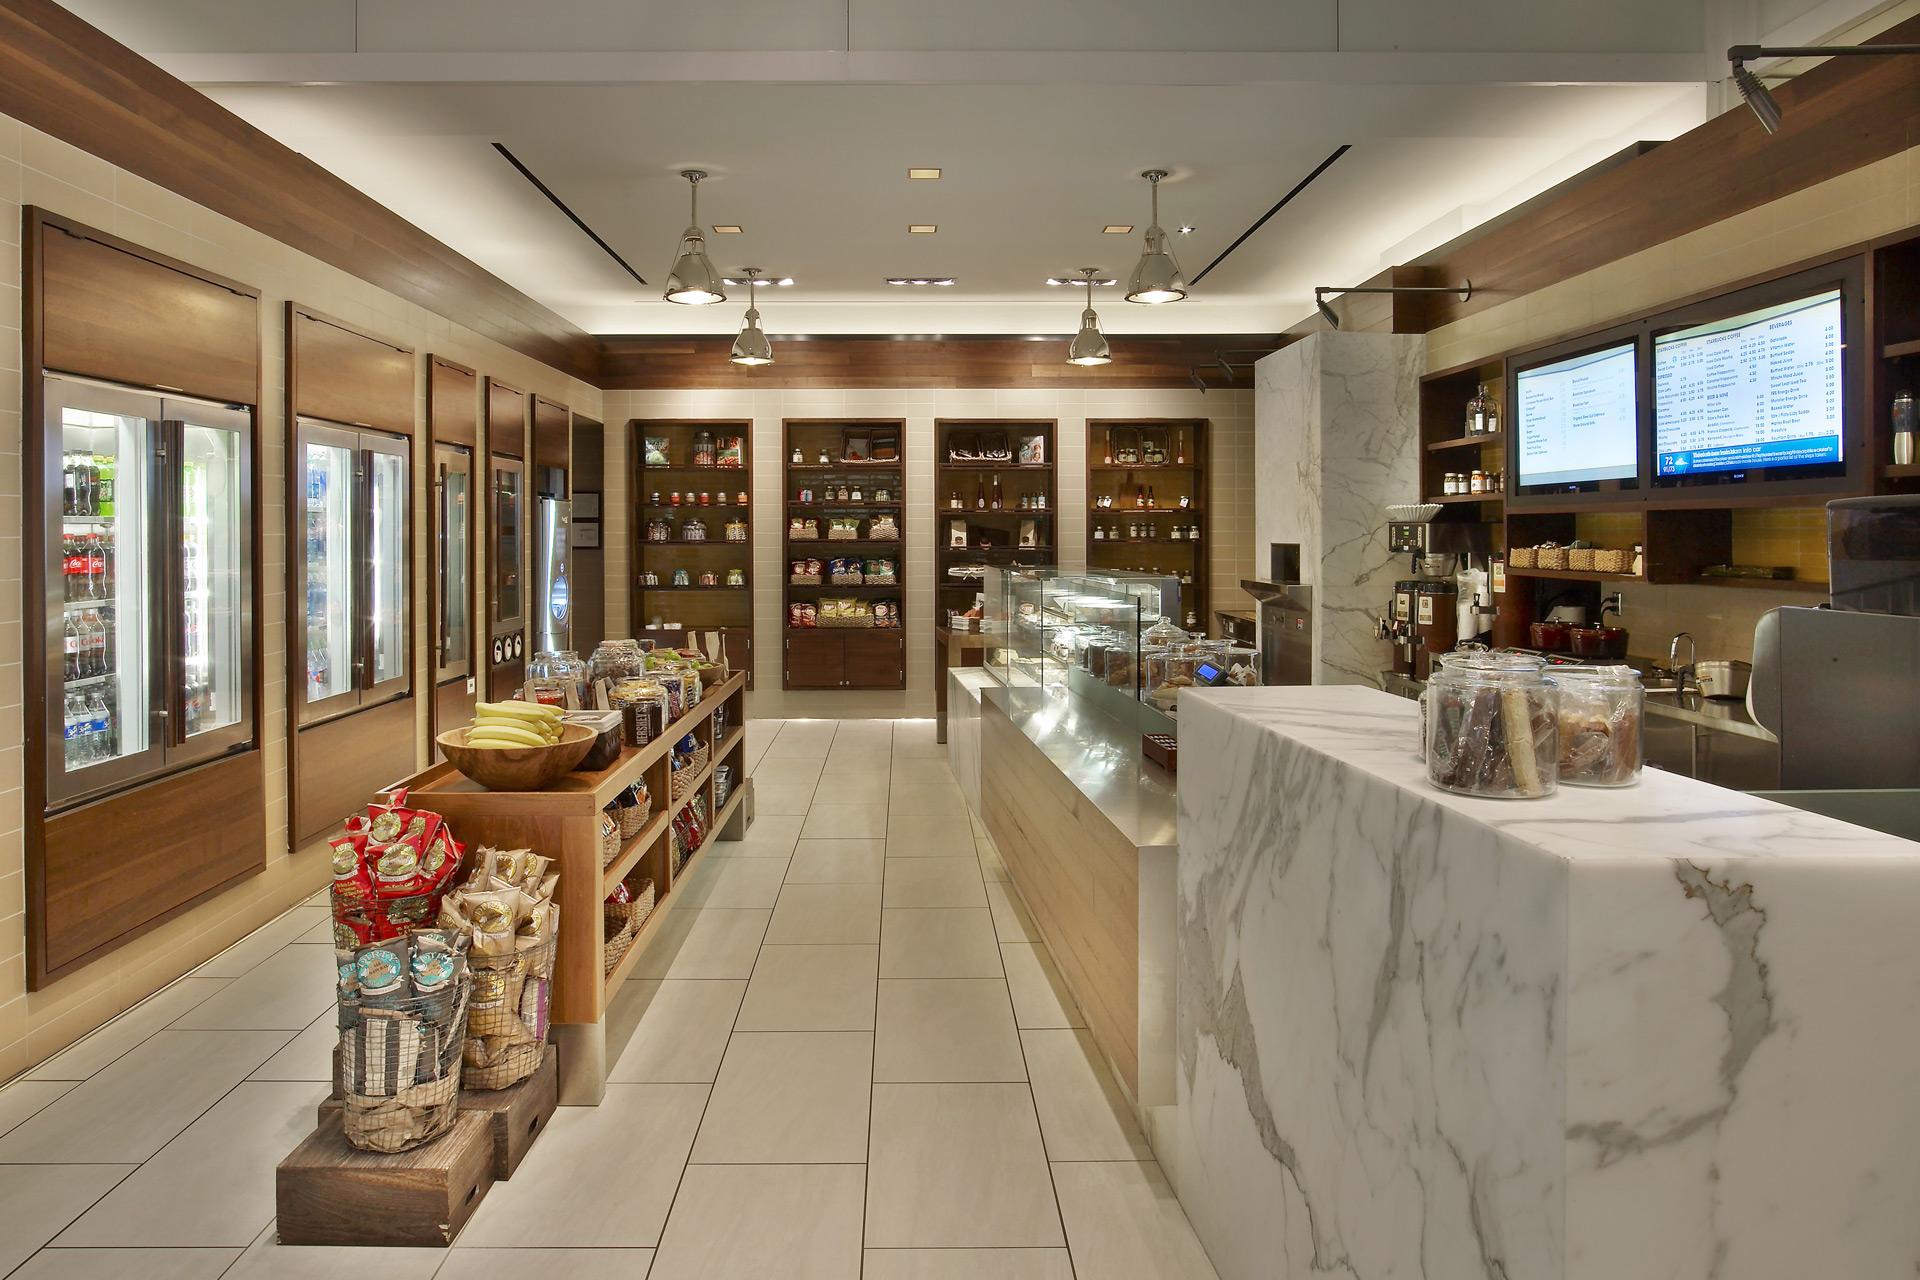 Twenty Two Storys & Market restaurant interiors